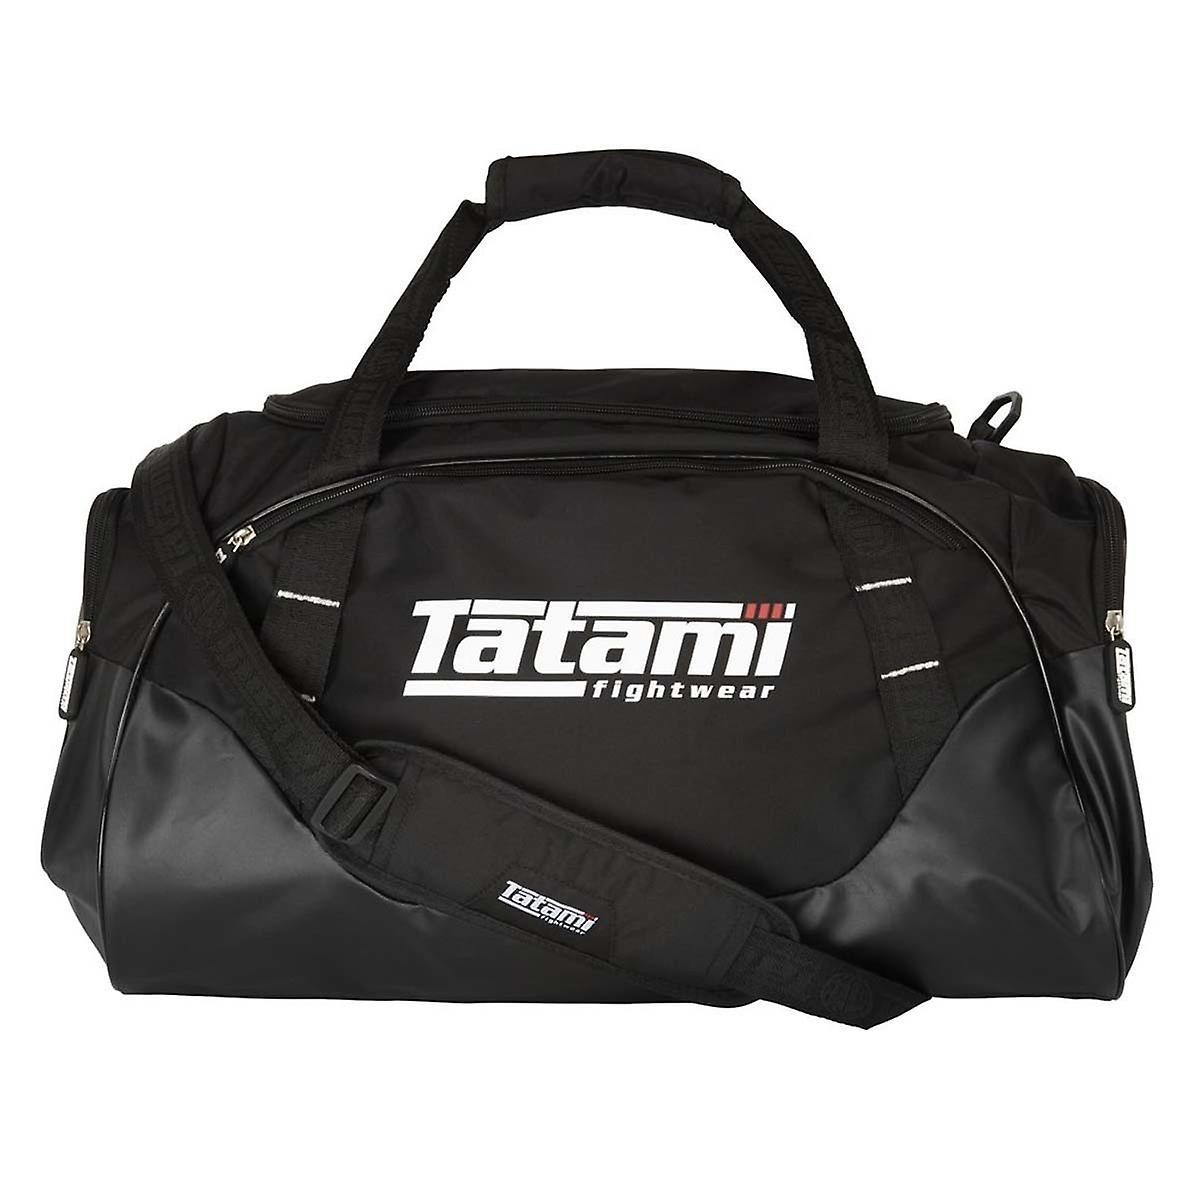 Tatami Fightwear Competitor Kit Bag Noir